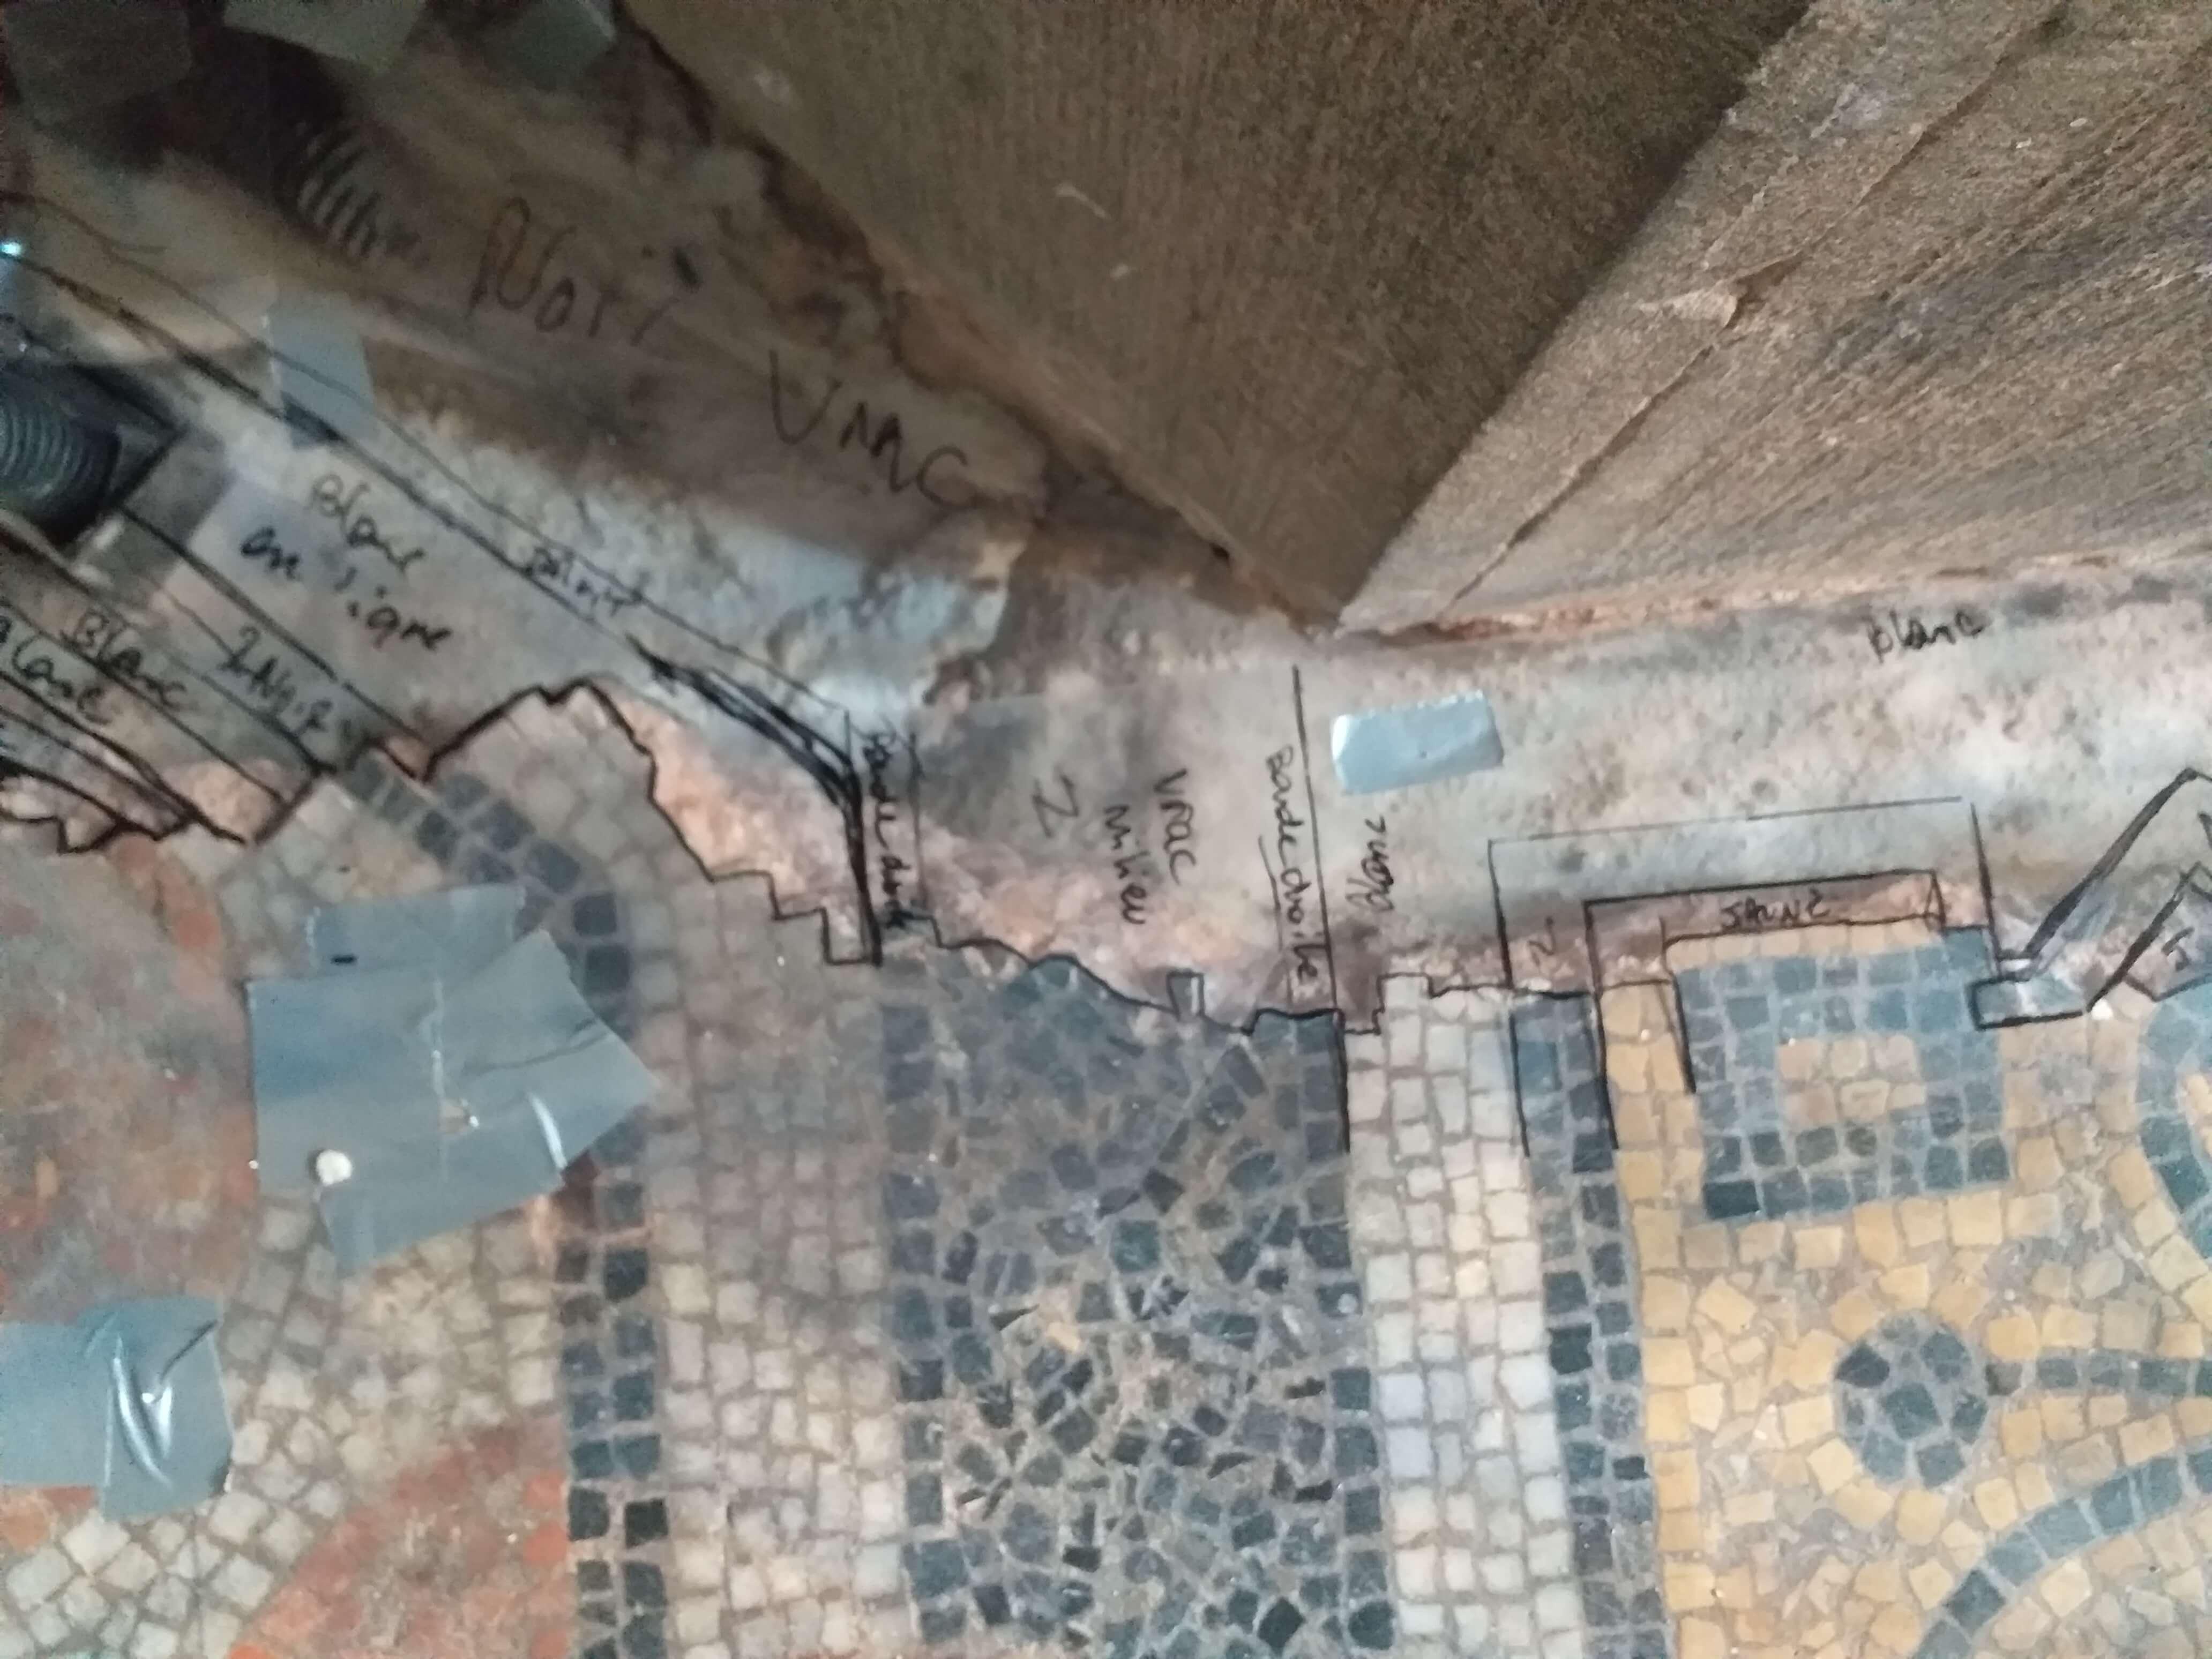 restauration-mosaique-sol-cathedrale